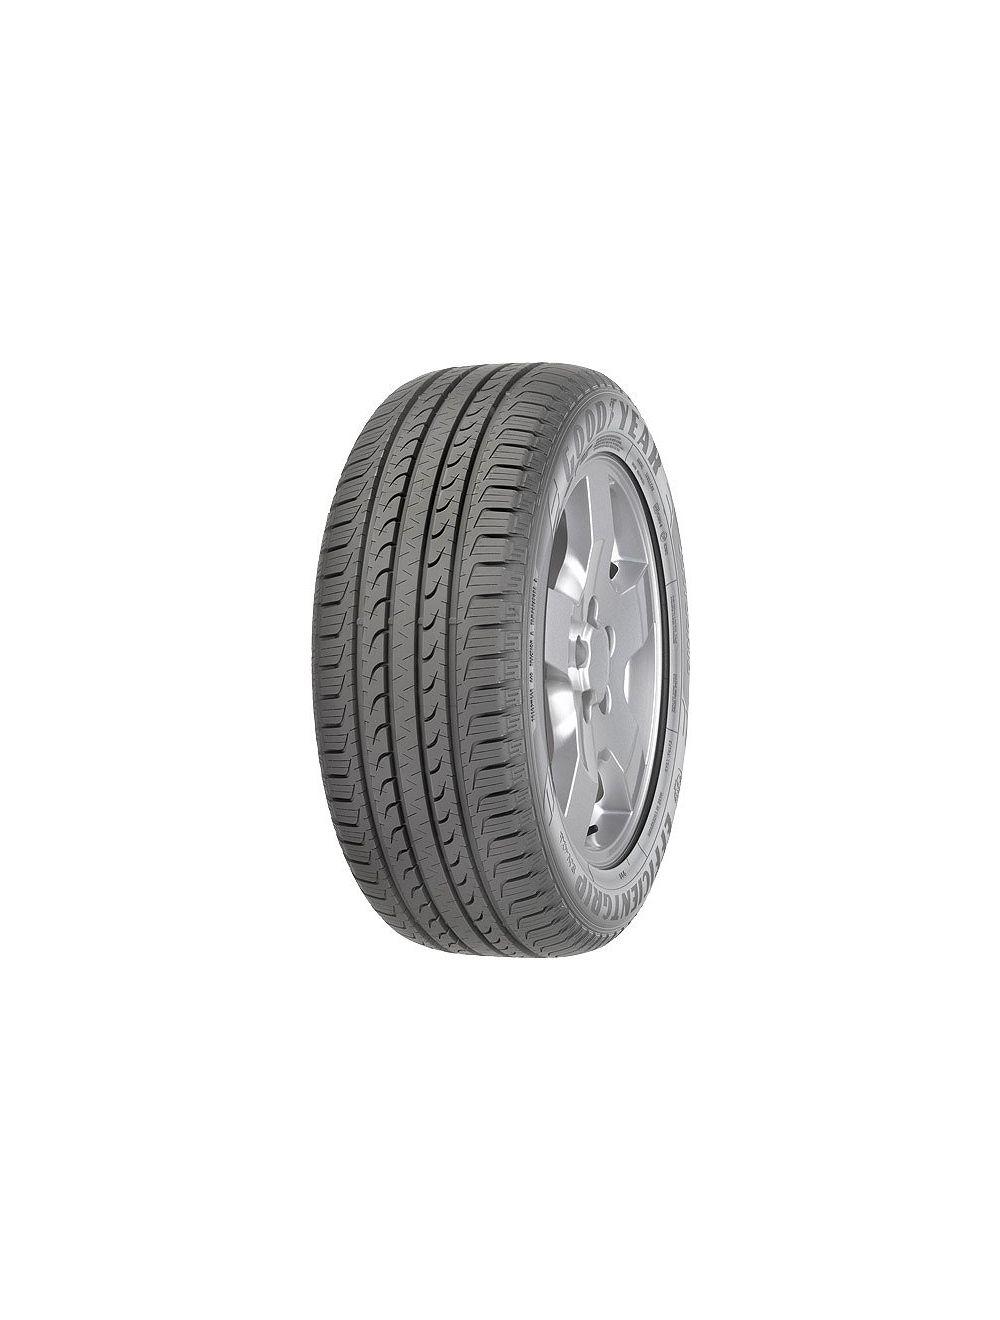 Goodyear 245/65R17 H Efficientgrip SUV XL FP Nyári gumi